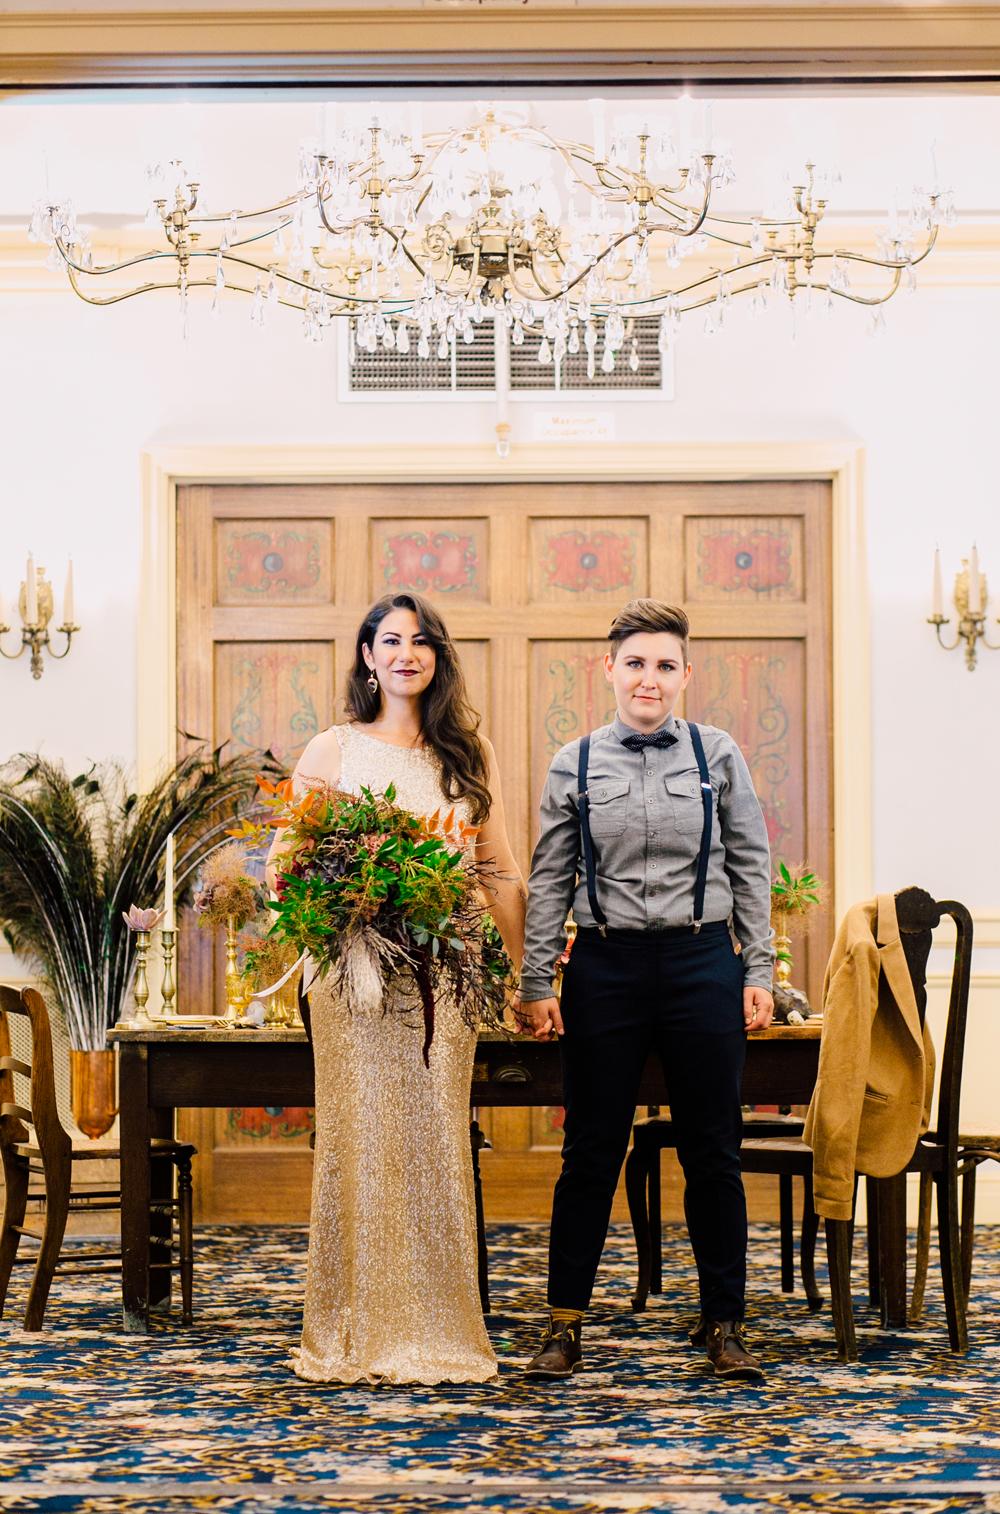 044-bellingham-leopold-crystal-ballroom-geode-wedding-katheryn-moran-photography.jpg